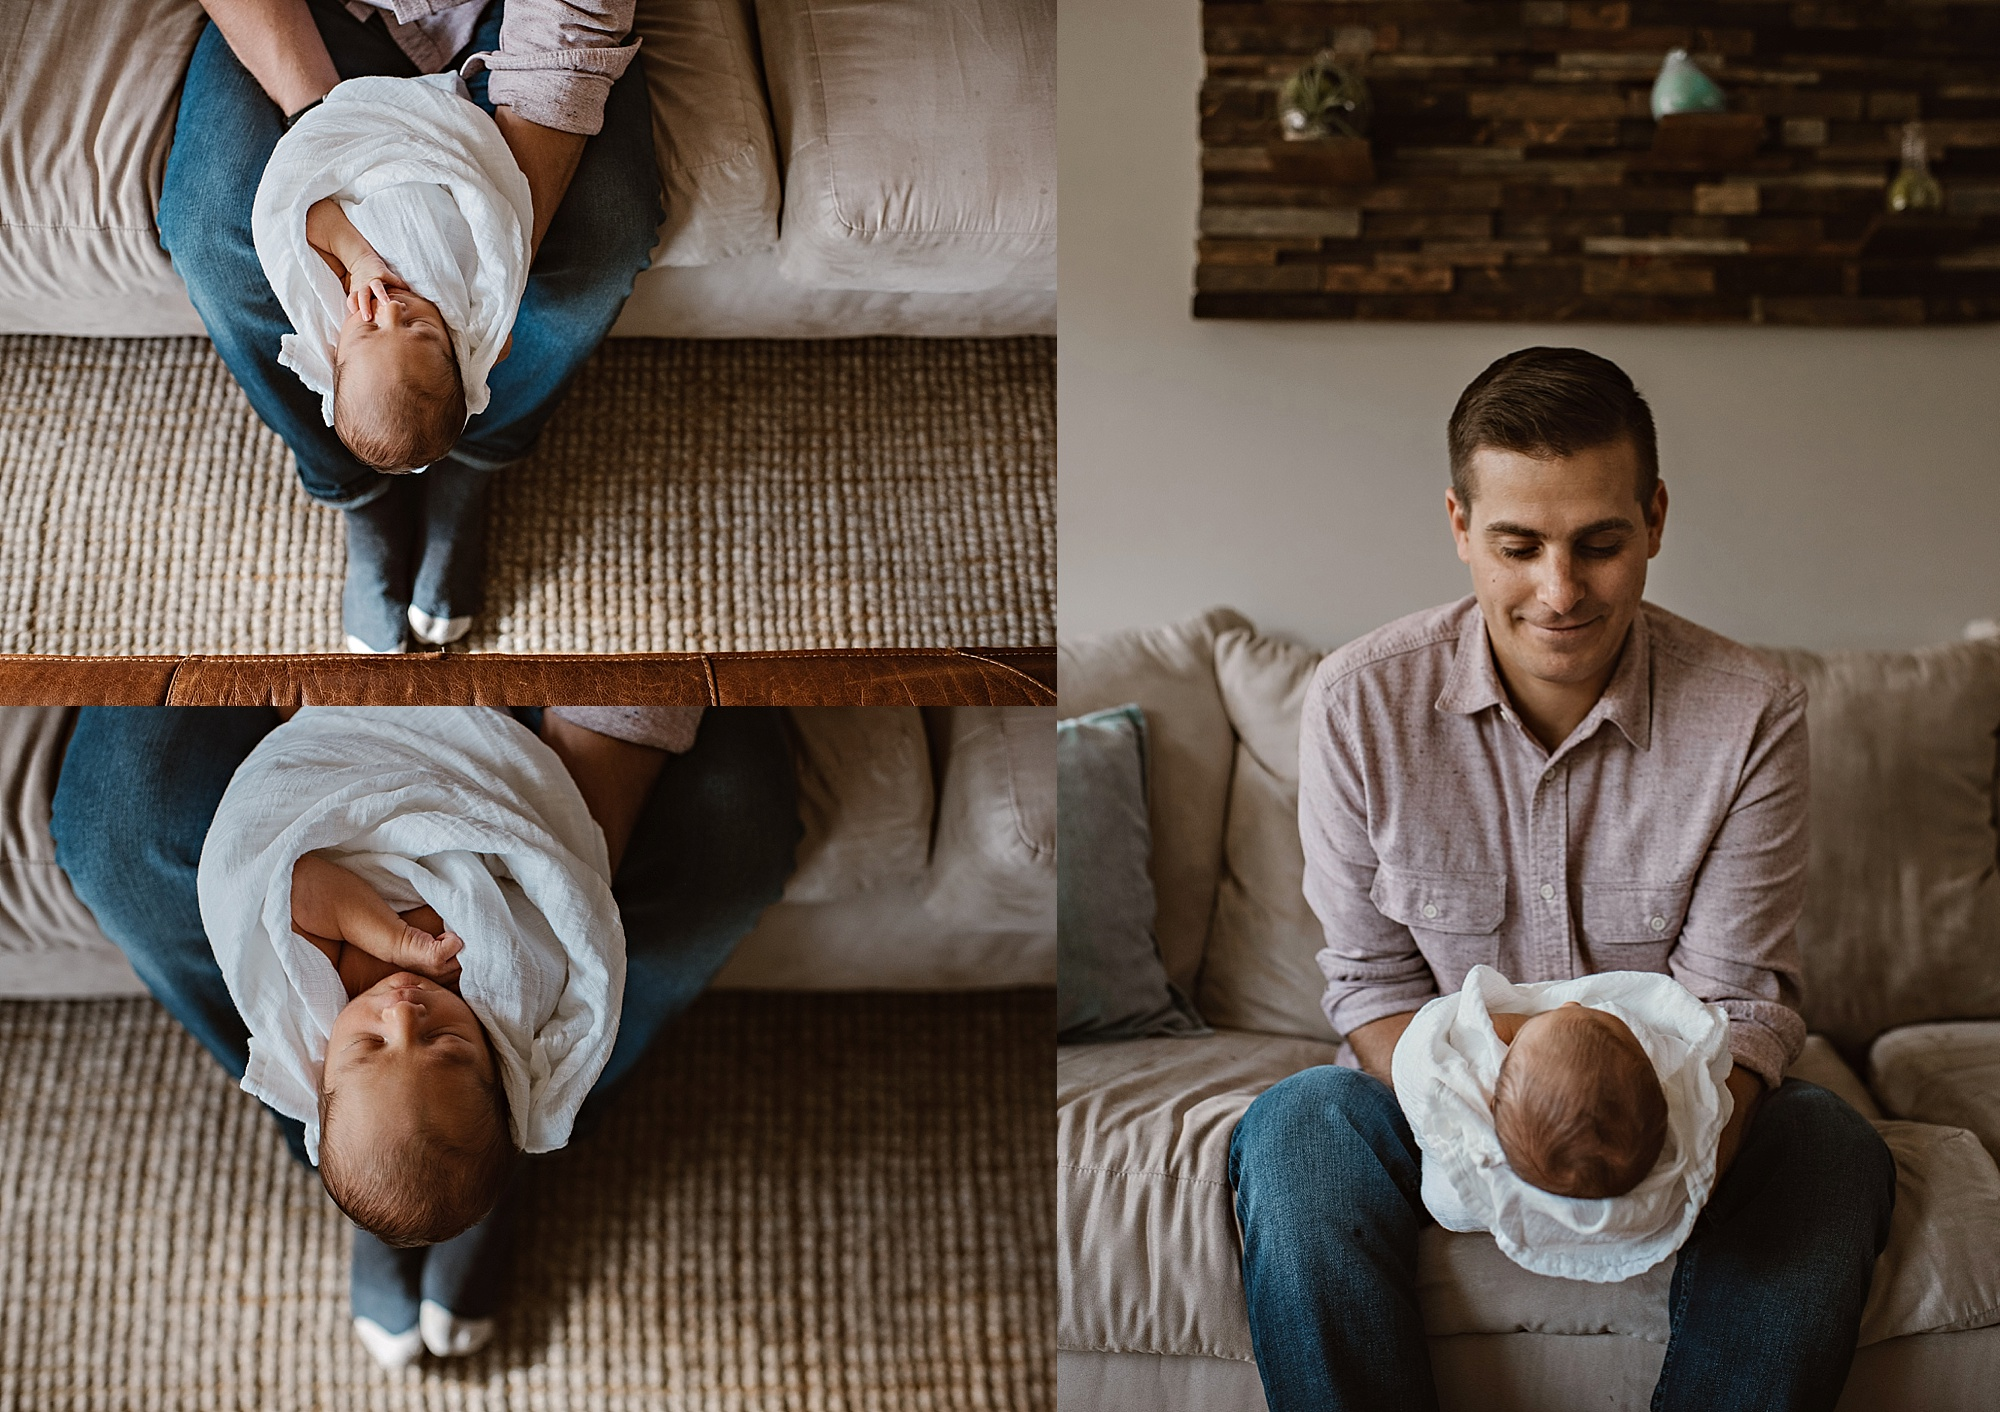 Welcome-baby-Cullin-akron-ohio-photographer-lauren-grayson-newborn-session_0010.jpg